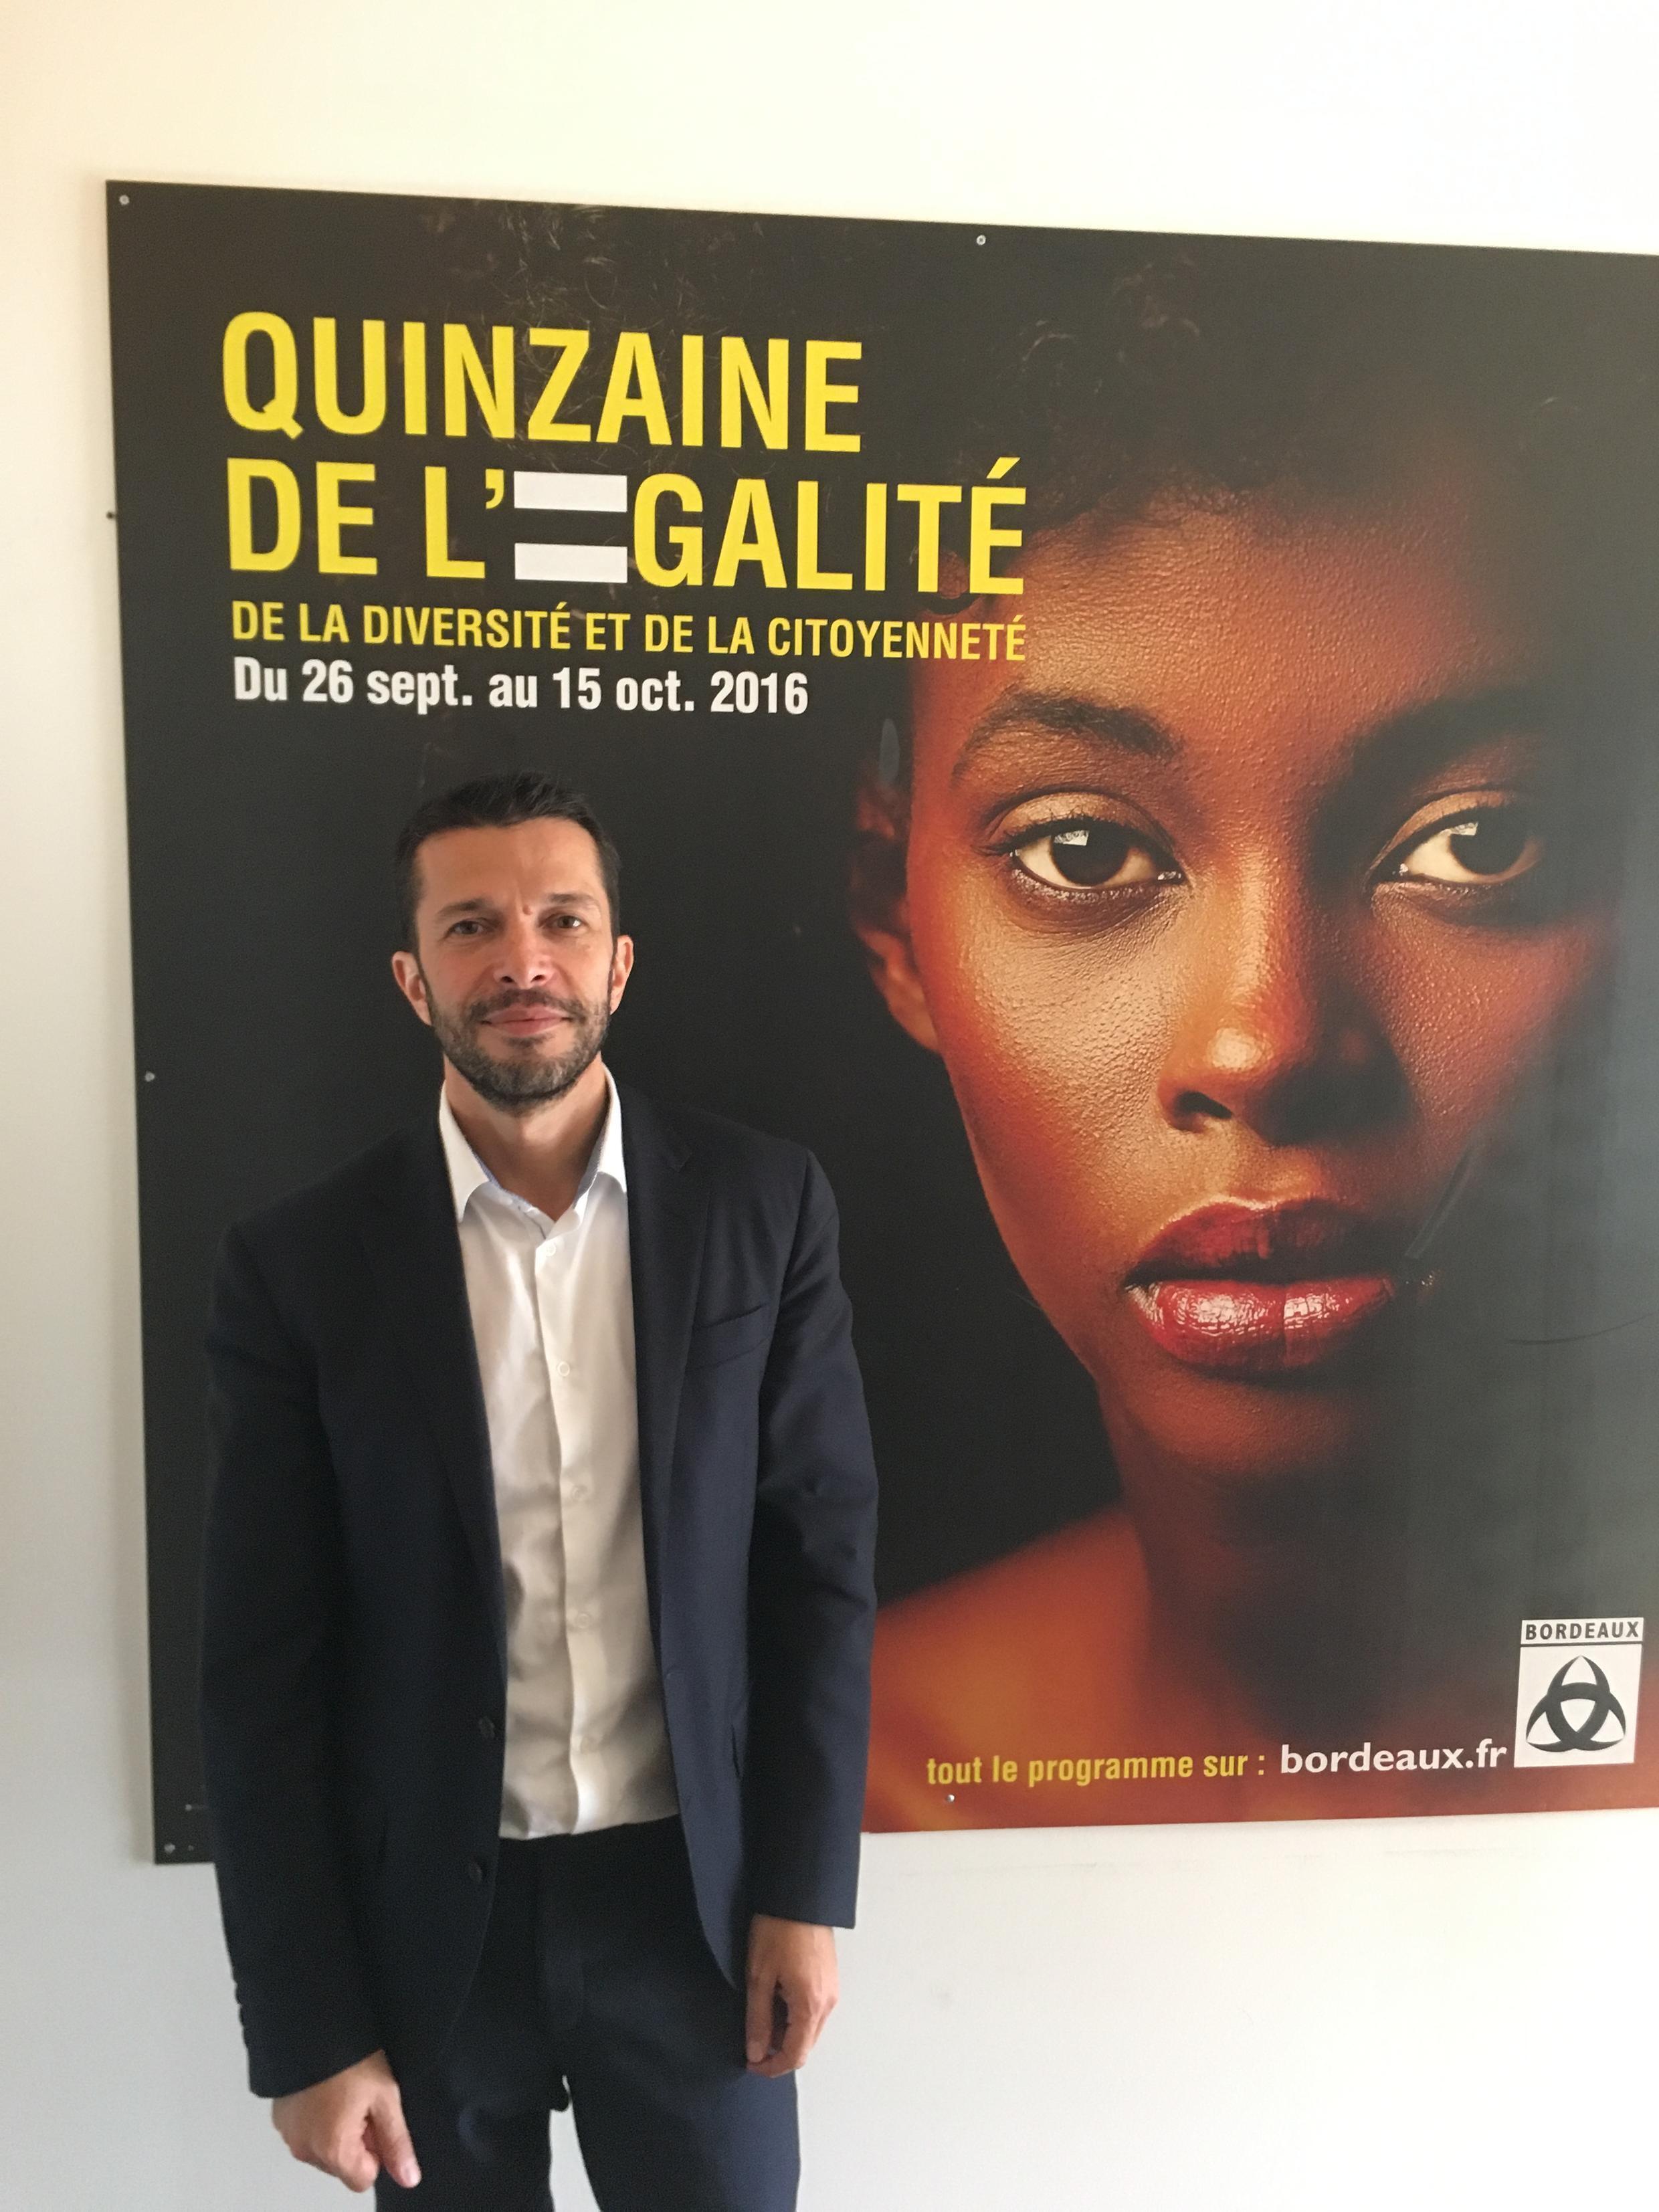 Marik Fetouh, Bordeaux deputy mayor in charge of diversity, 20 February 2019